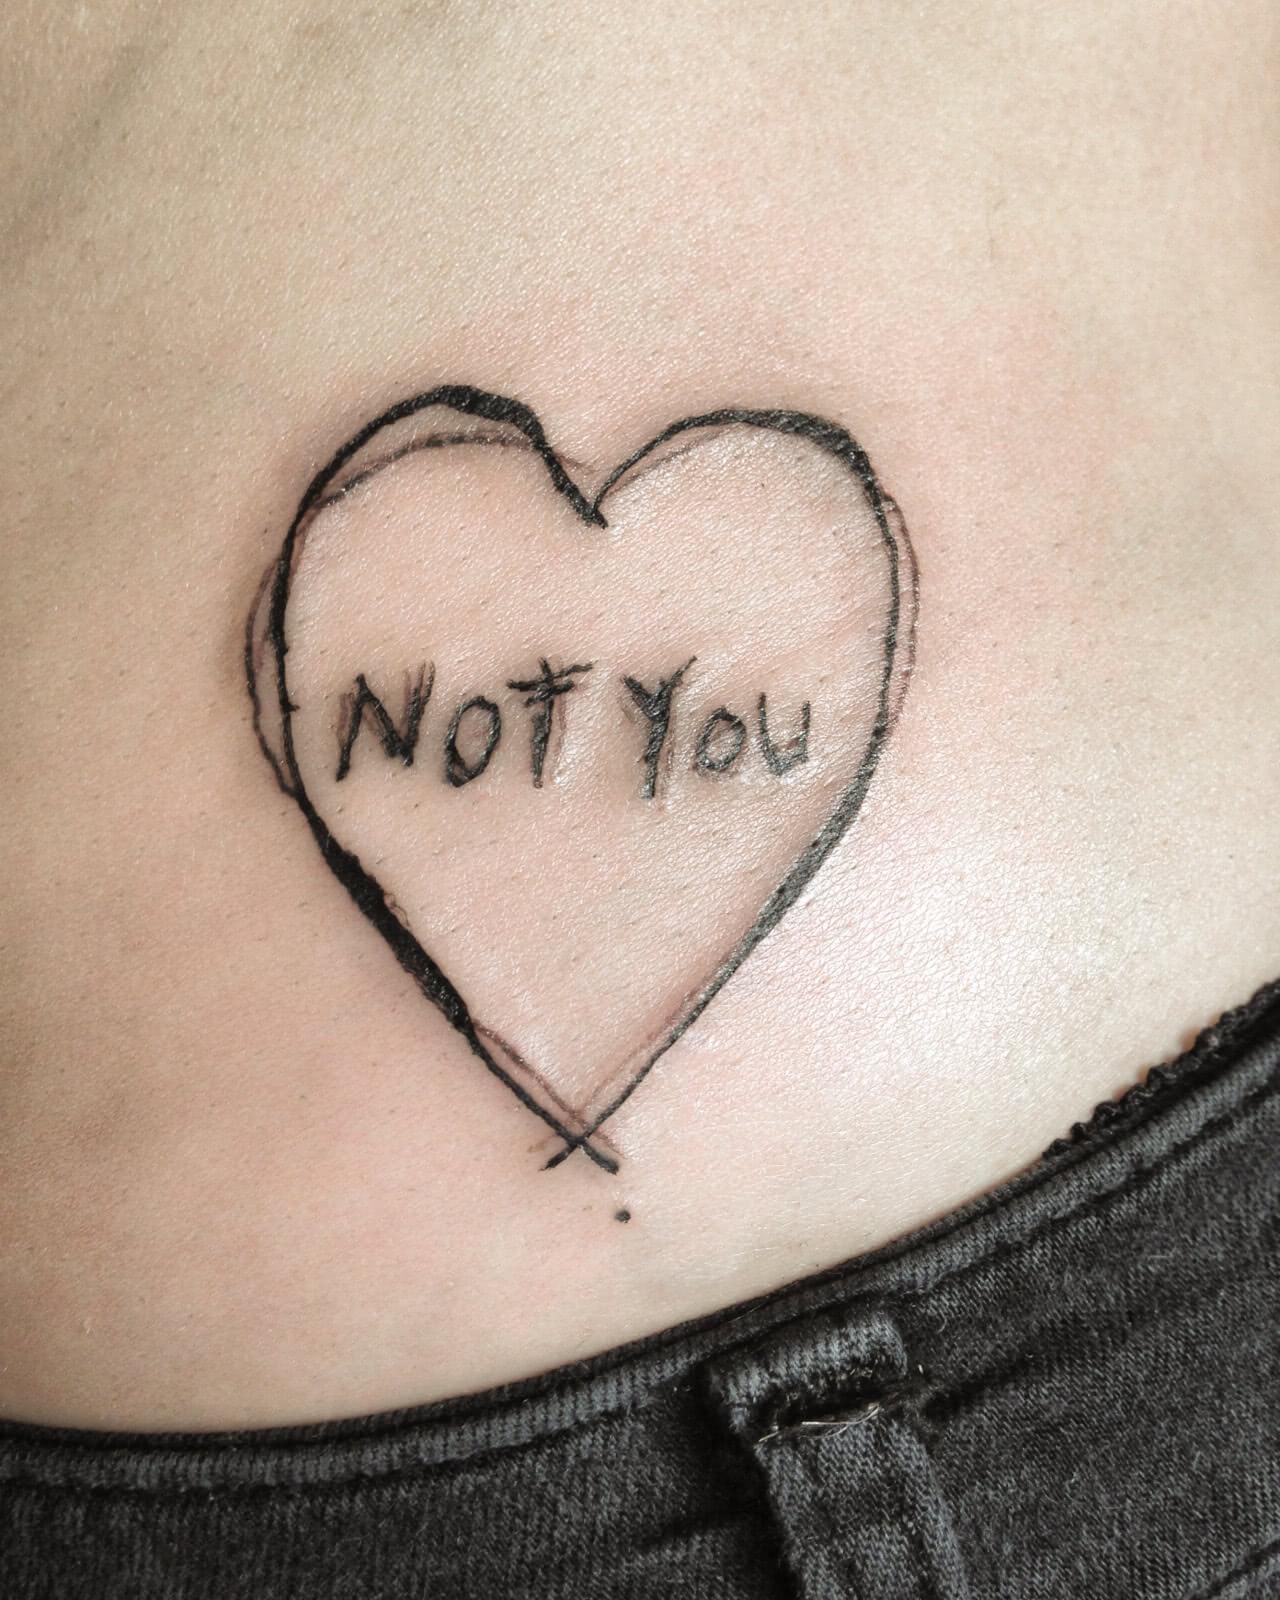 Tattoo Herz Not You